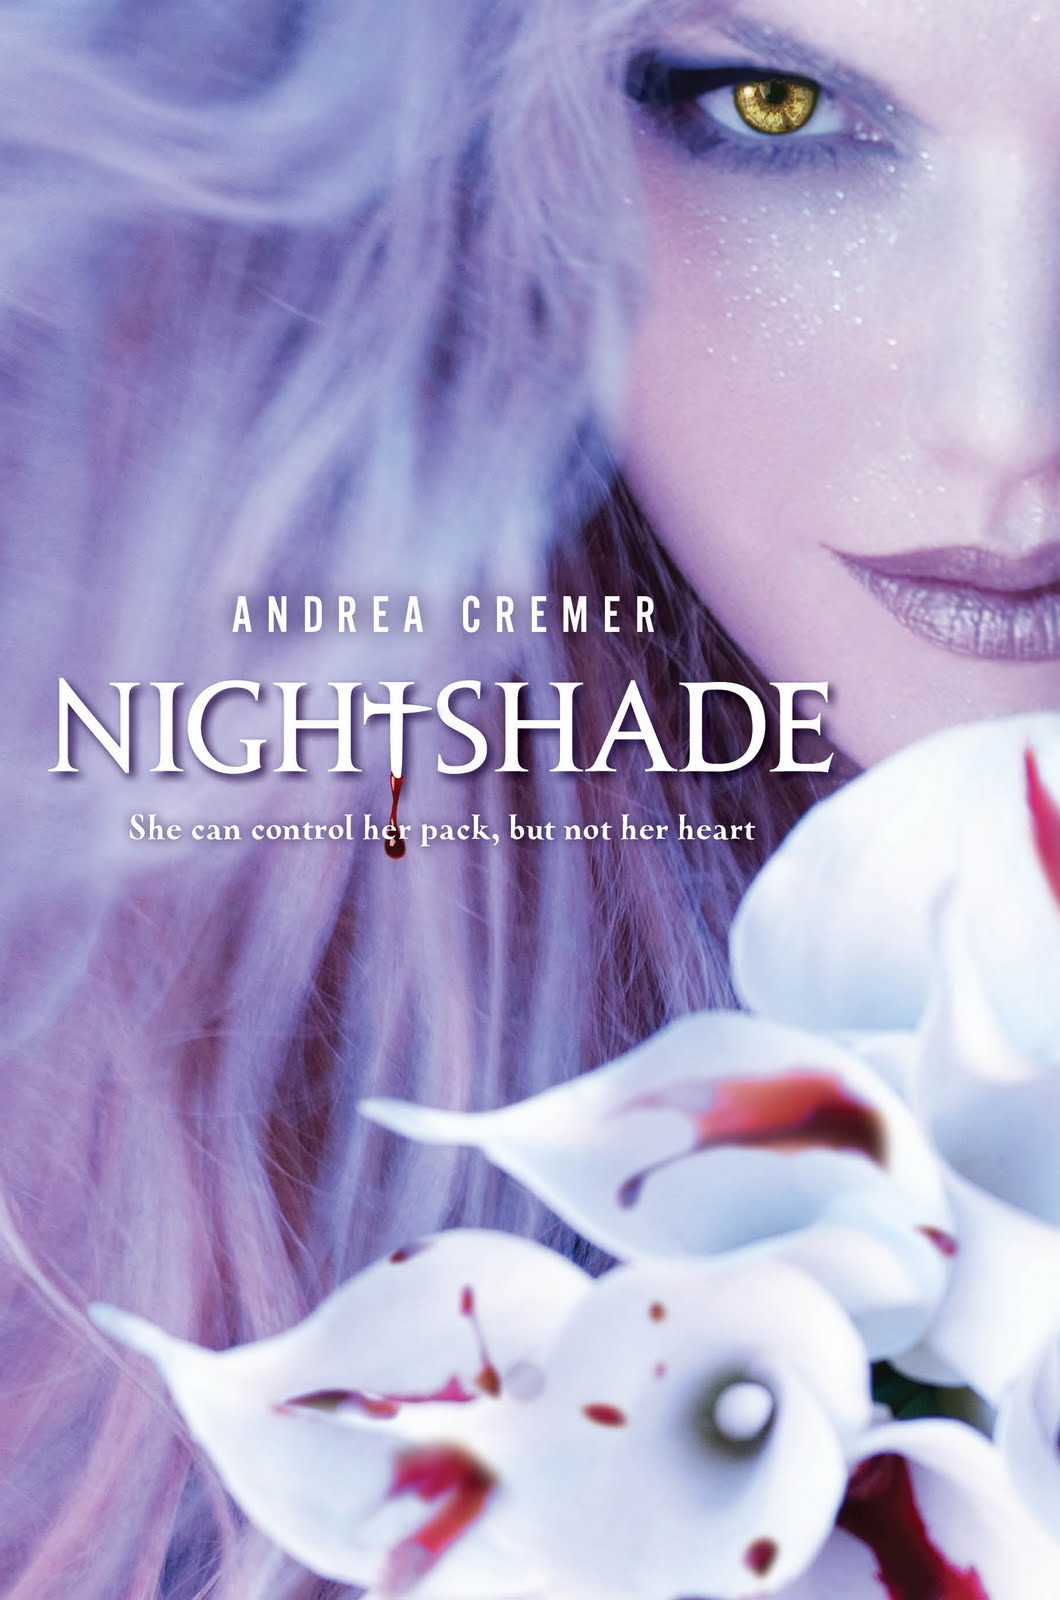 Nightshade Book 3 Book Review Nightshade by